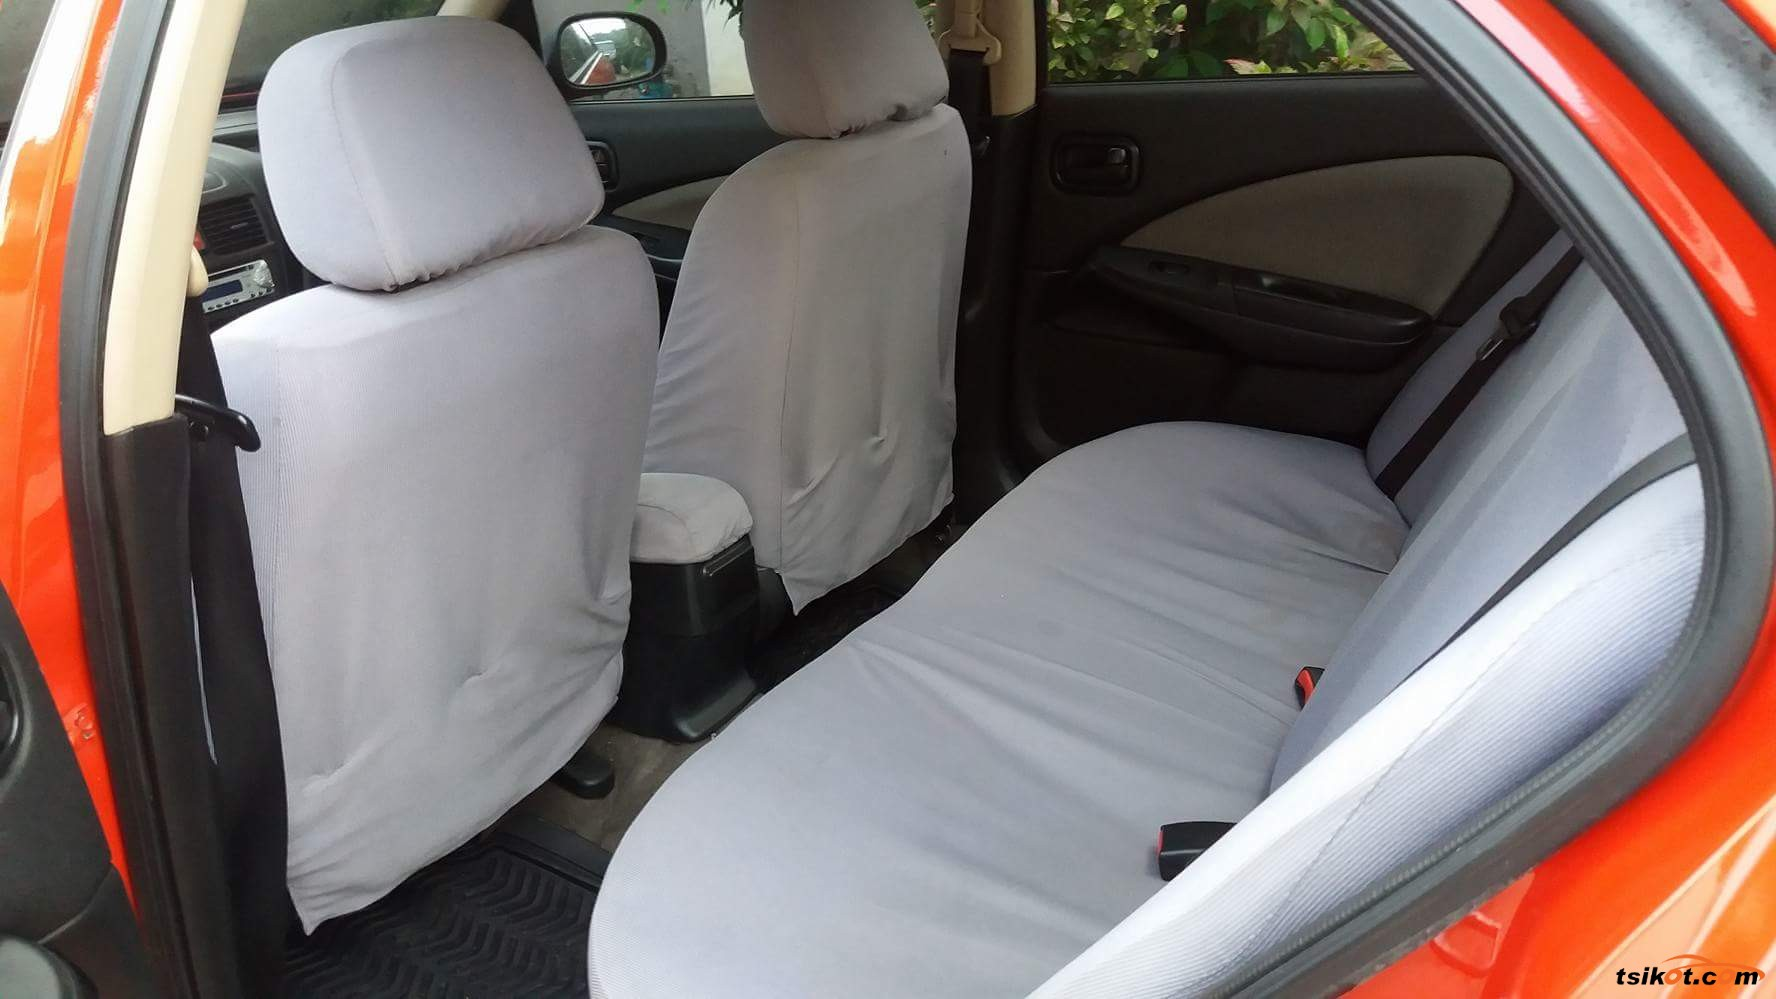 Nissan Sentra 2005 - 2